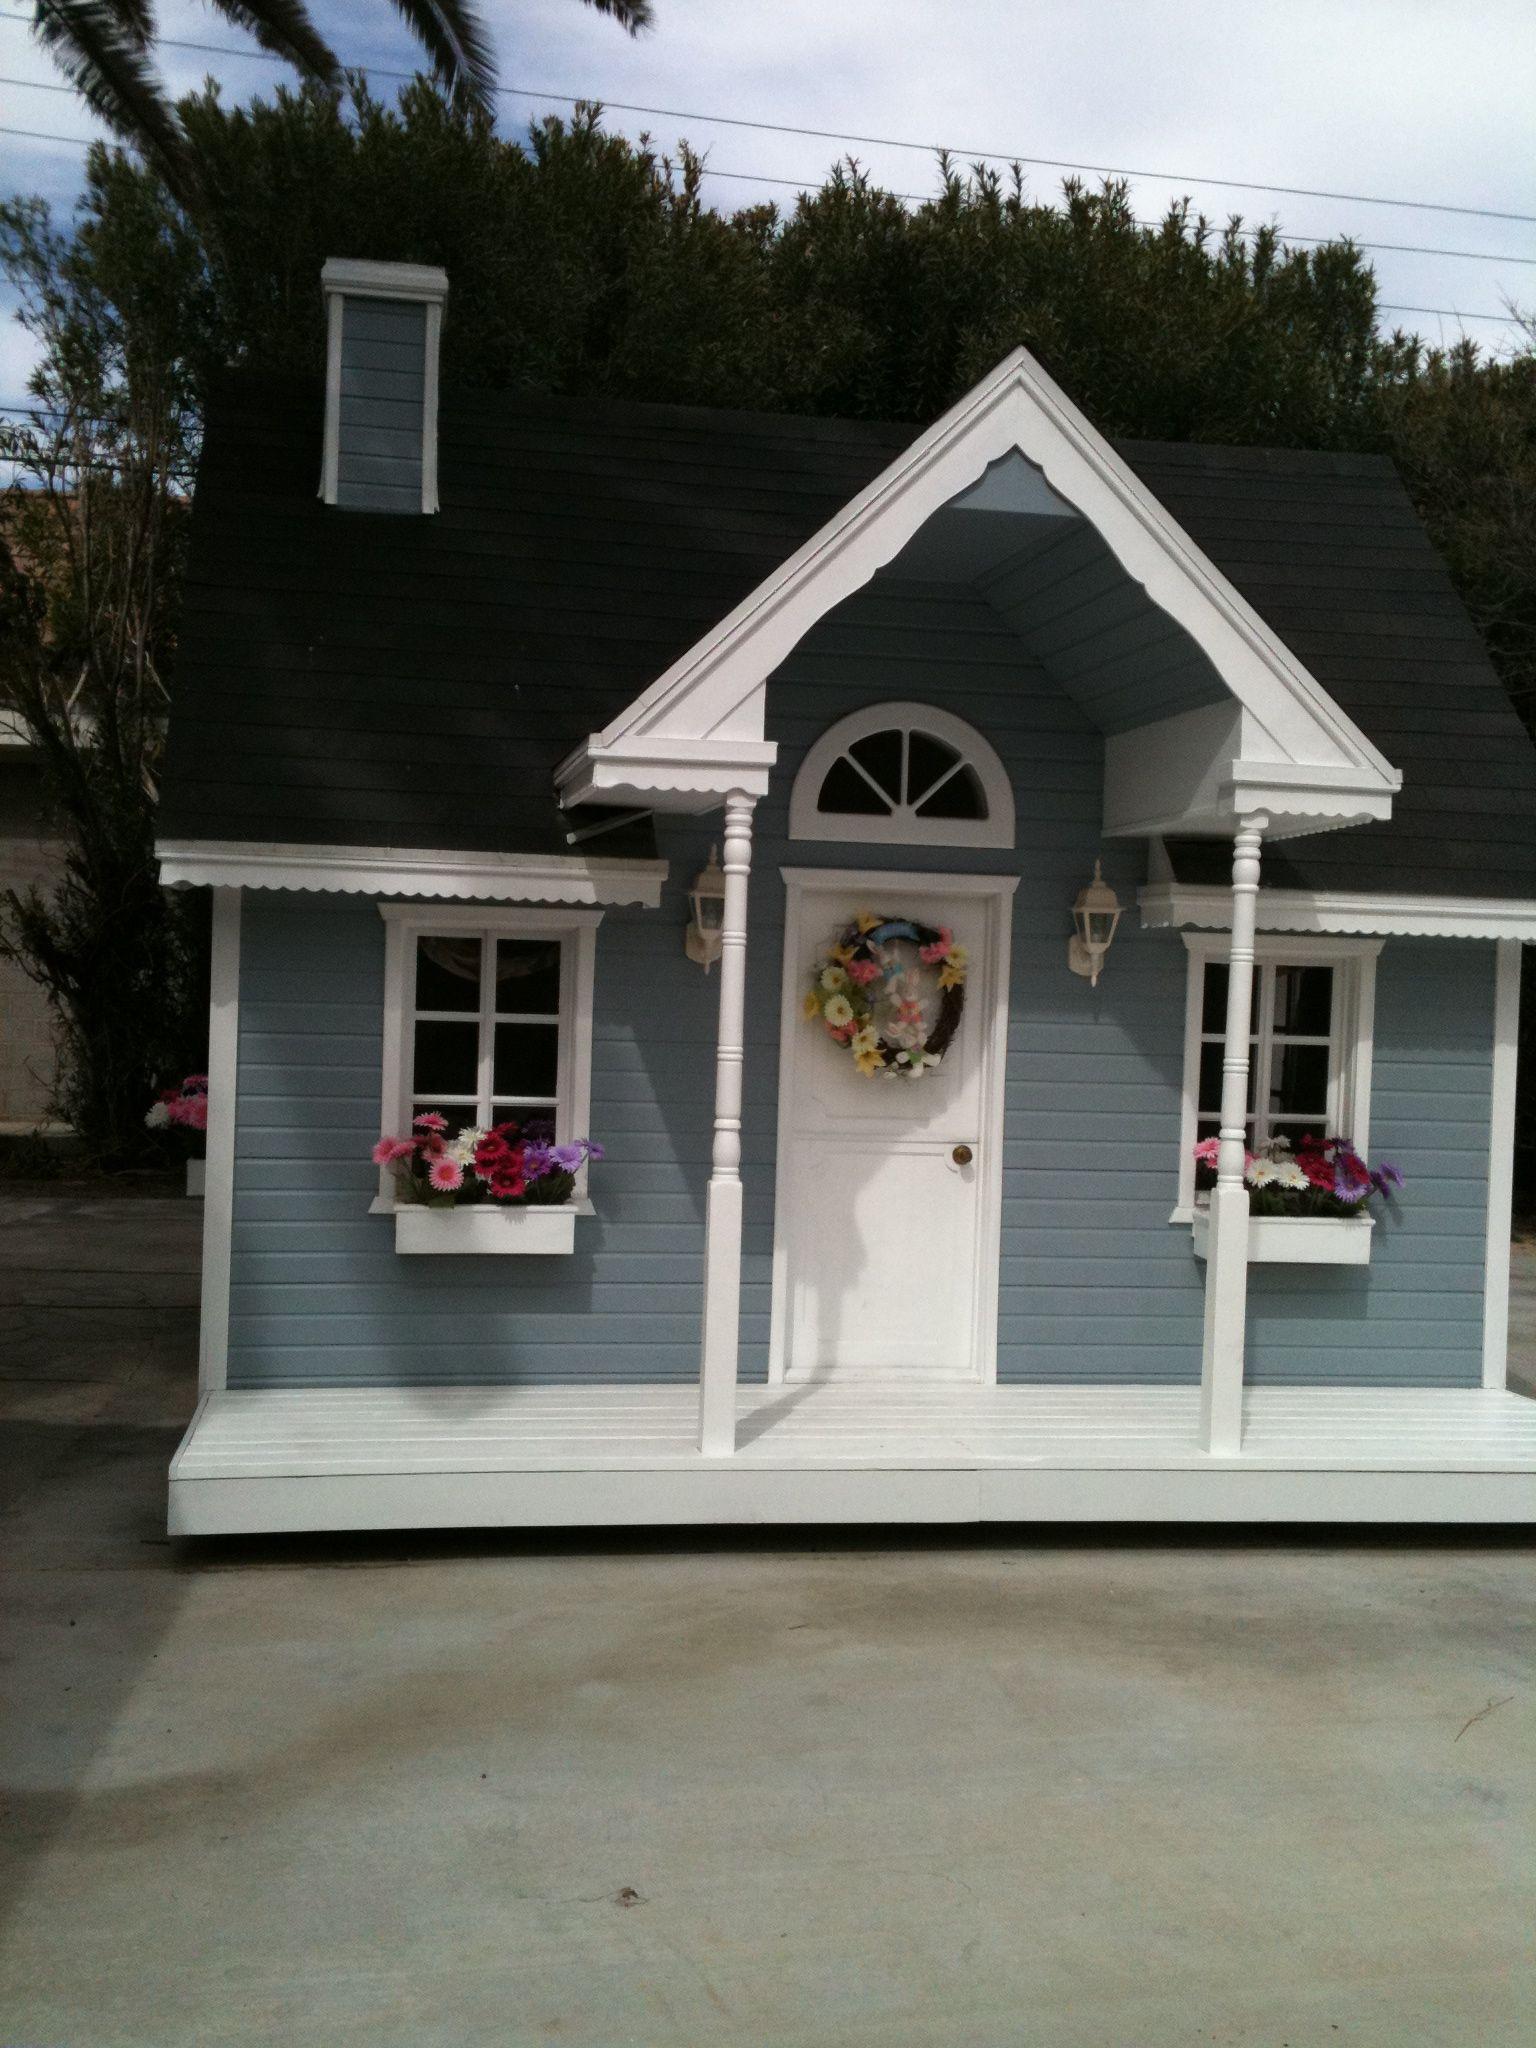 Tiny backyard house (With images) | Tiny backyard house ...